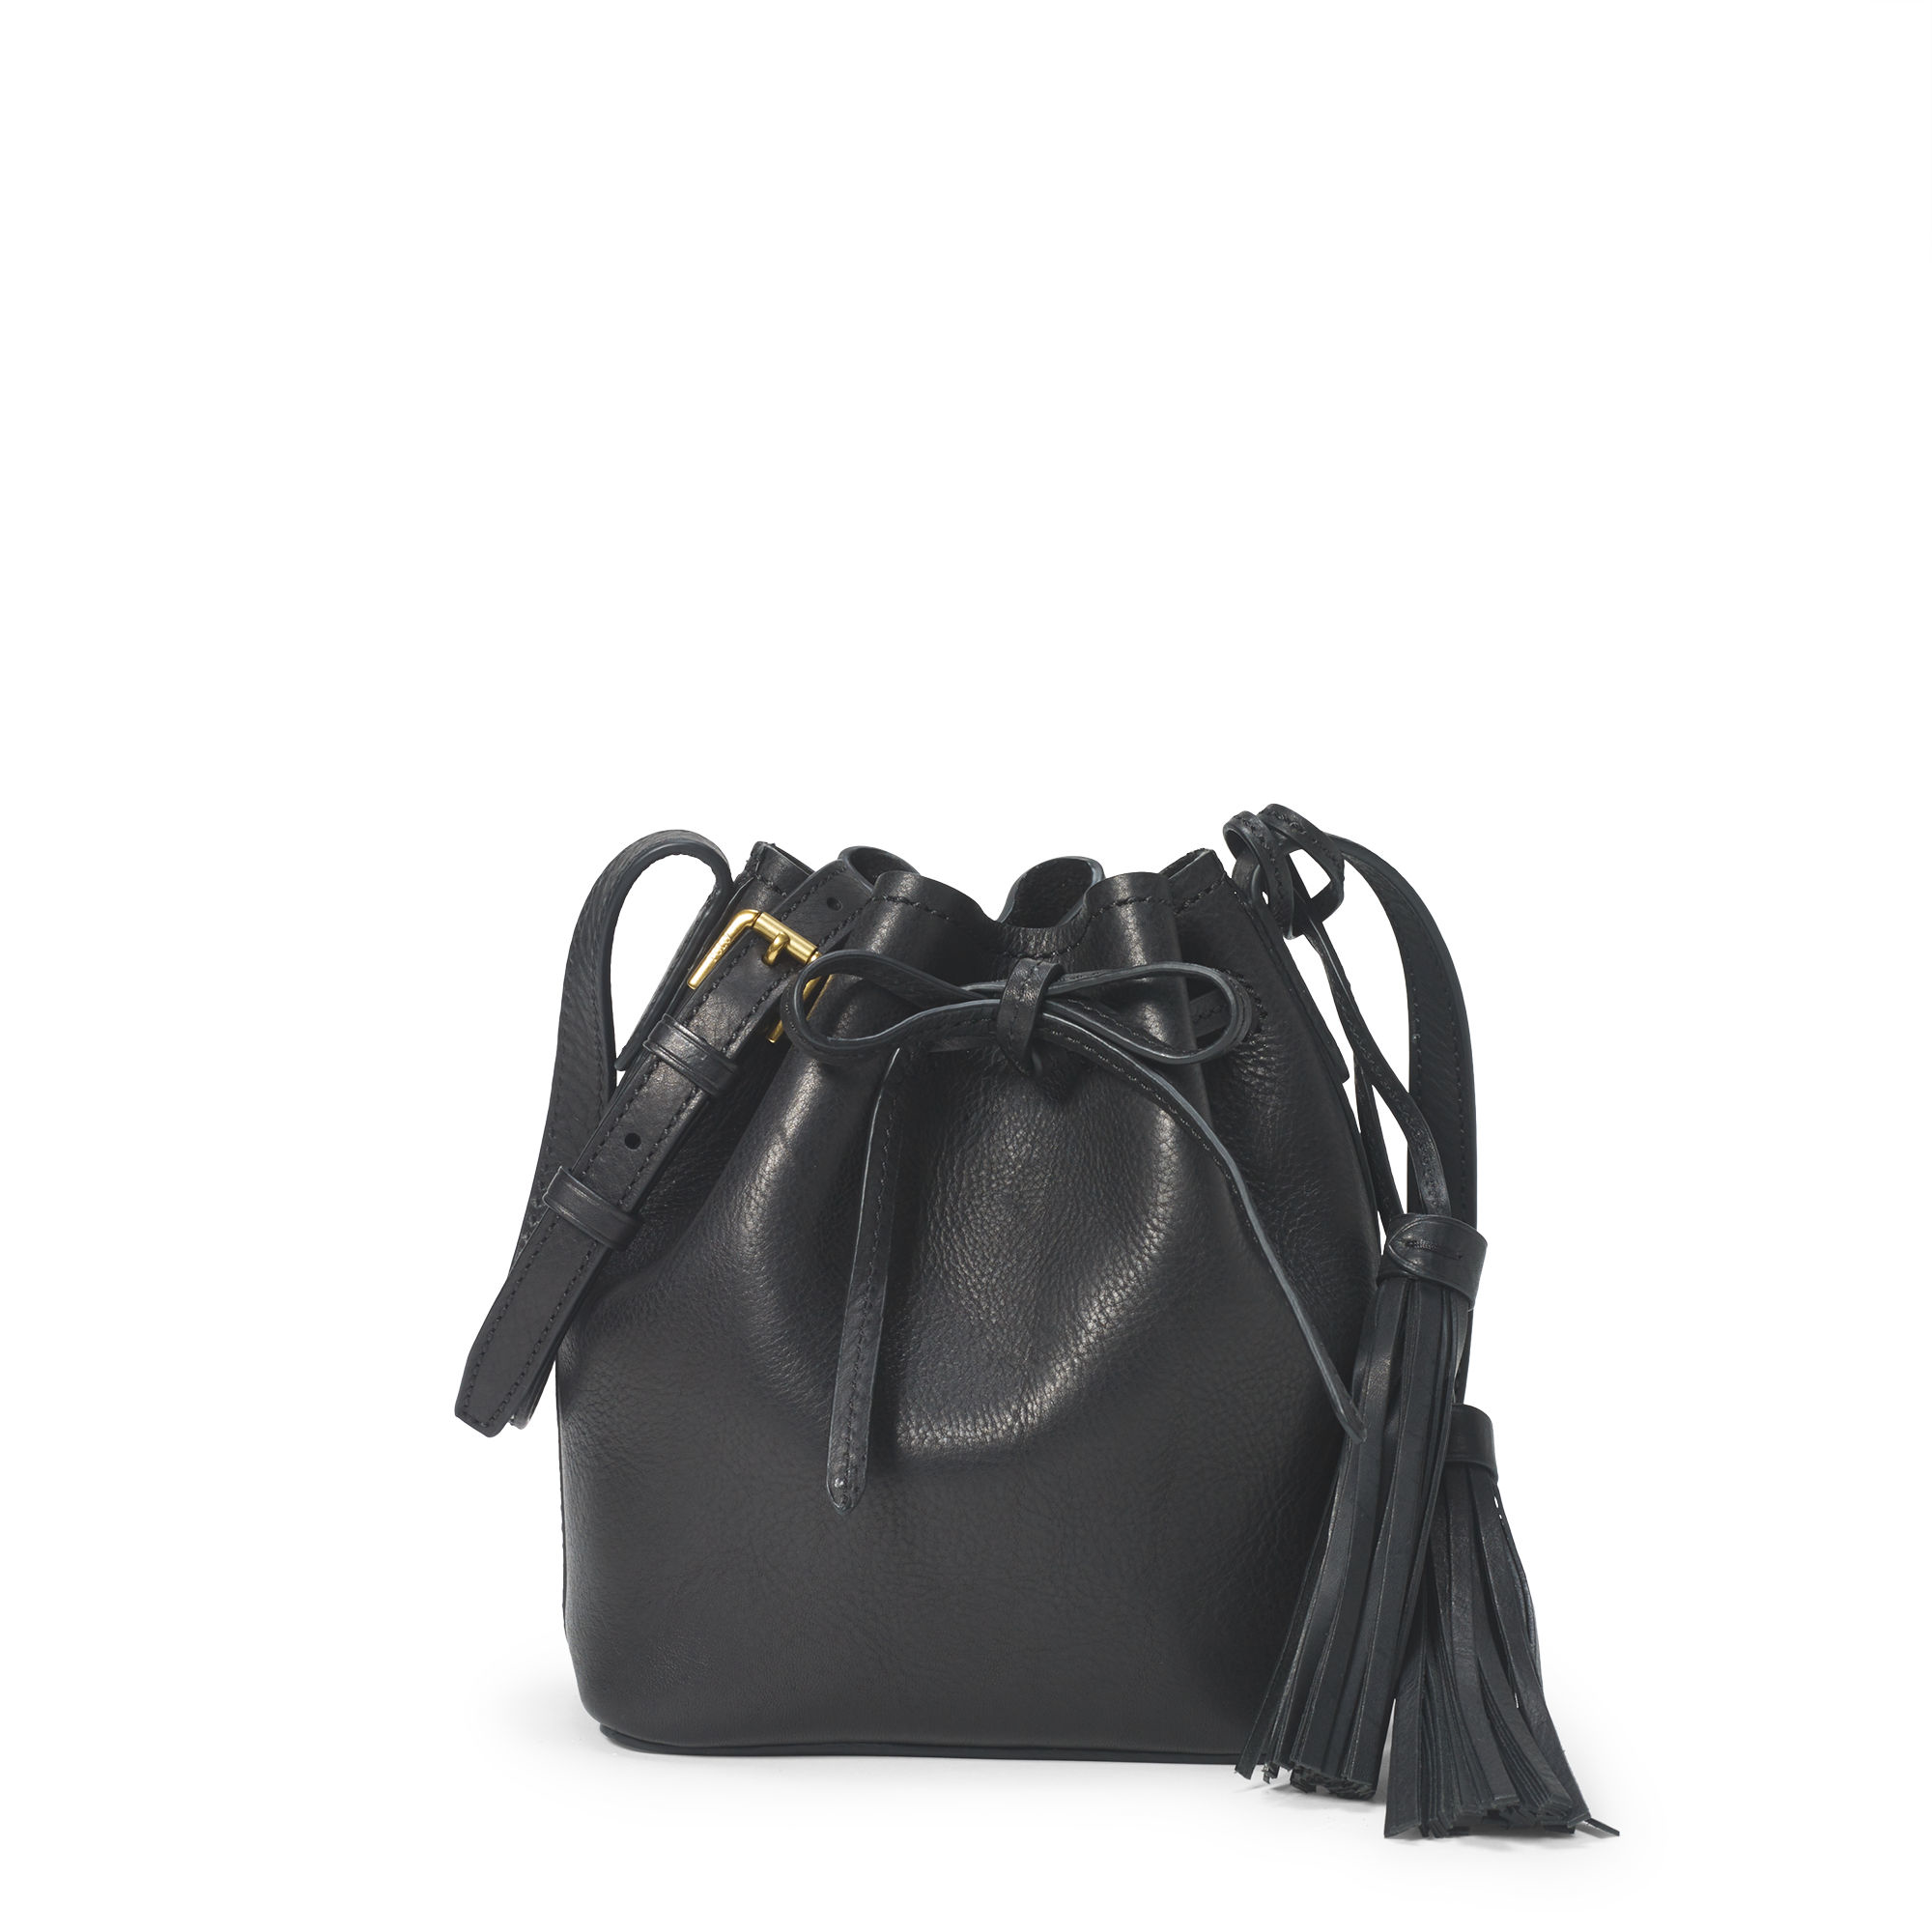 1b71d0d3ffe1 Polo Ralph Lauren Mini Leather Bucket Bag in Black - Lyst